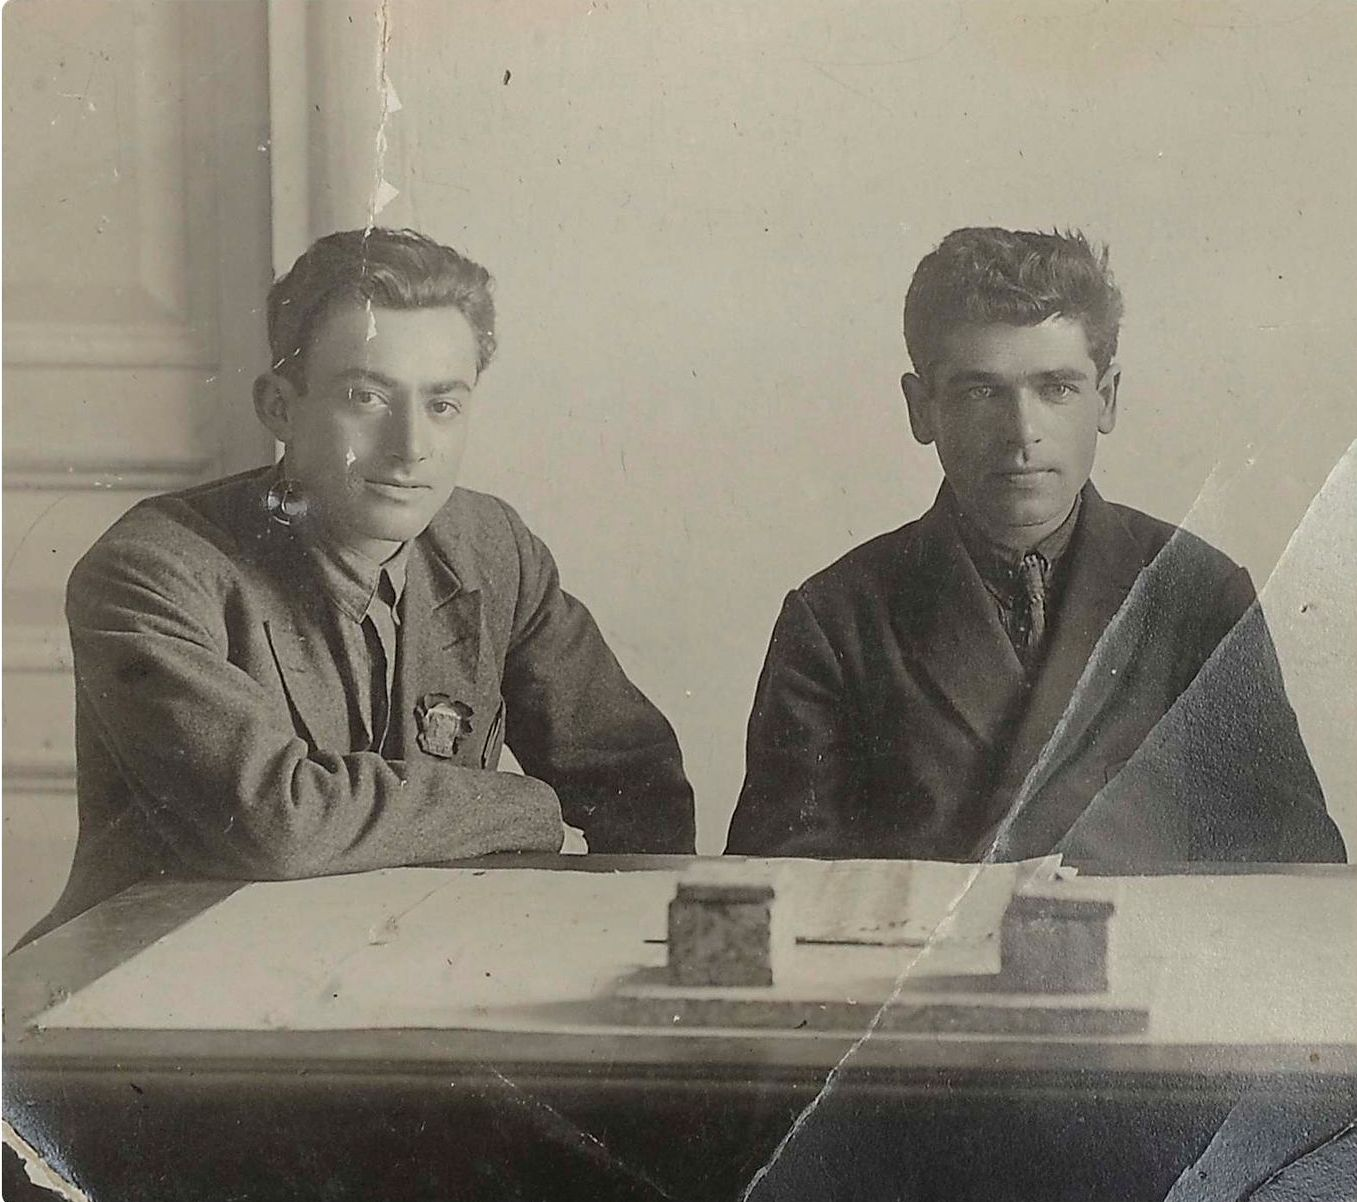 1920-е. Фото заведующего секретариатом Н. Бухарина Ефима Викторовича Цетлина с сотрудником